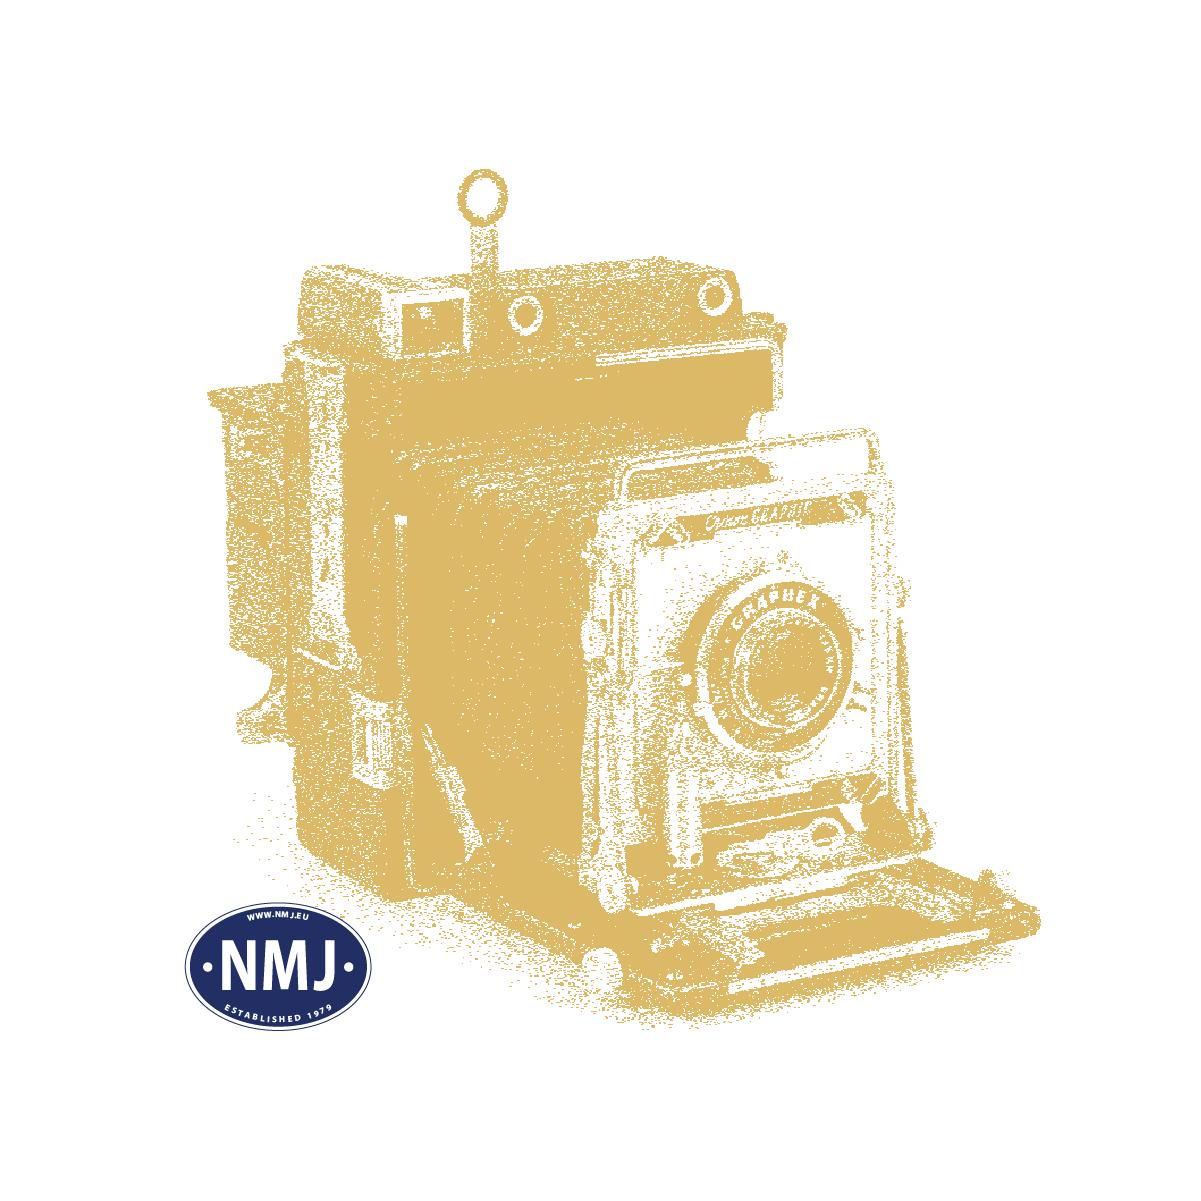 NMJT504.403 - NMJ Topline NSB His 210 2 597-2, type 4